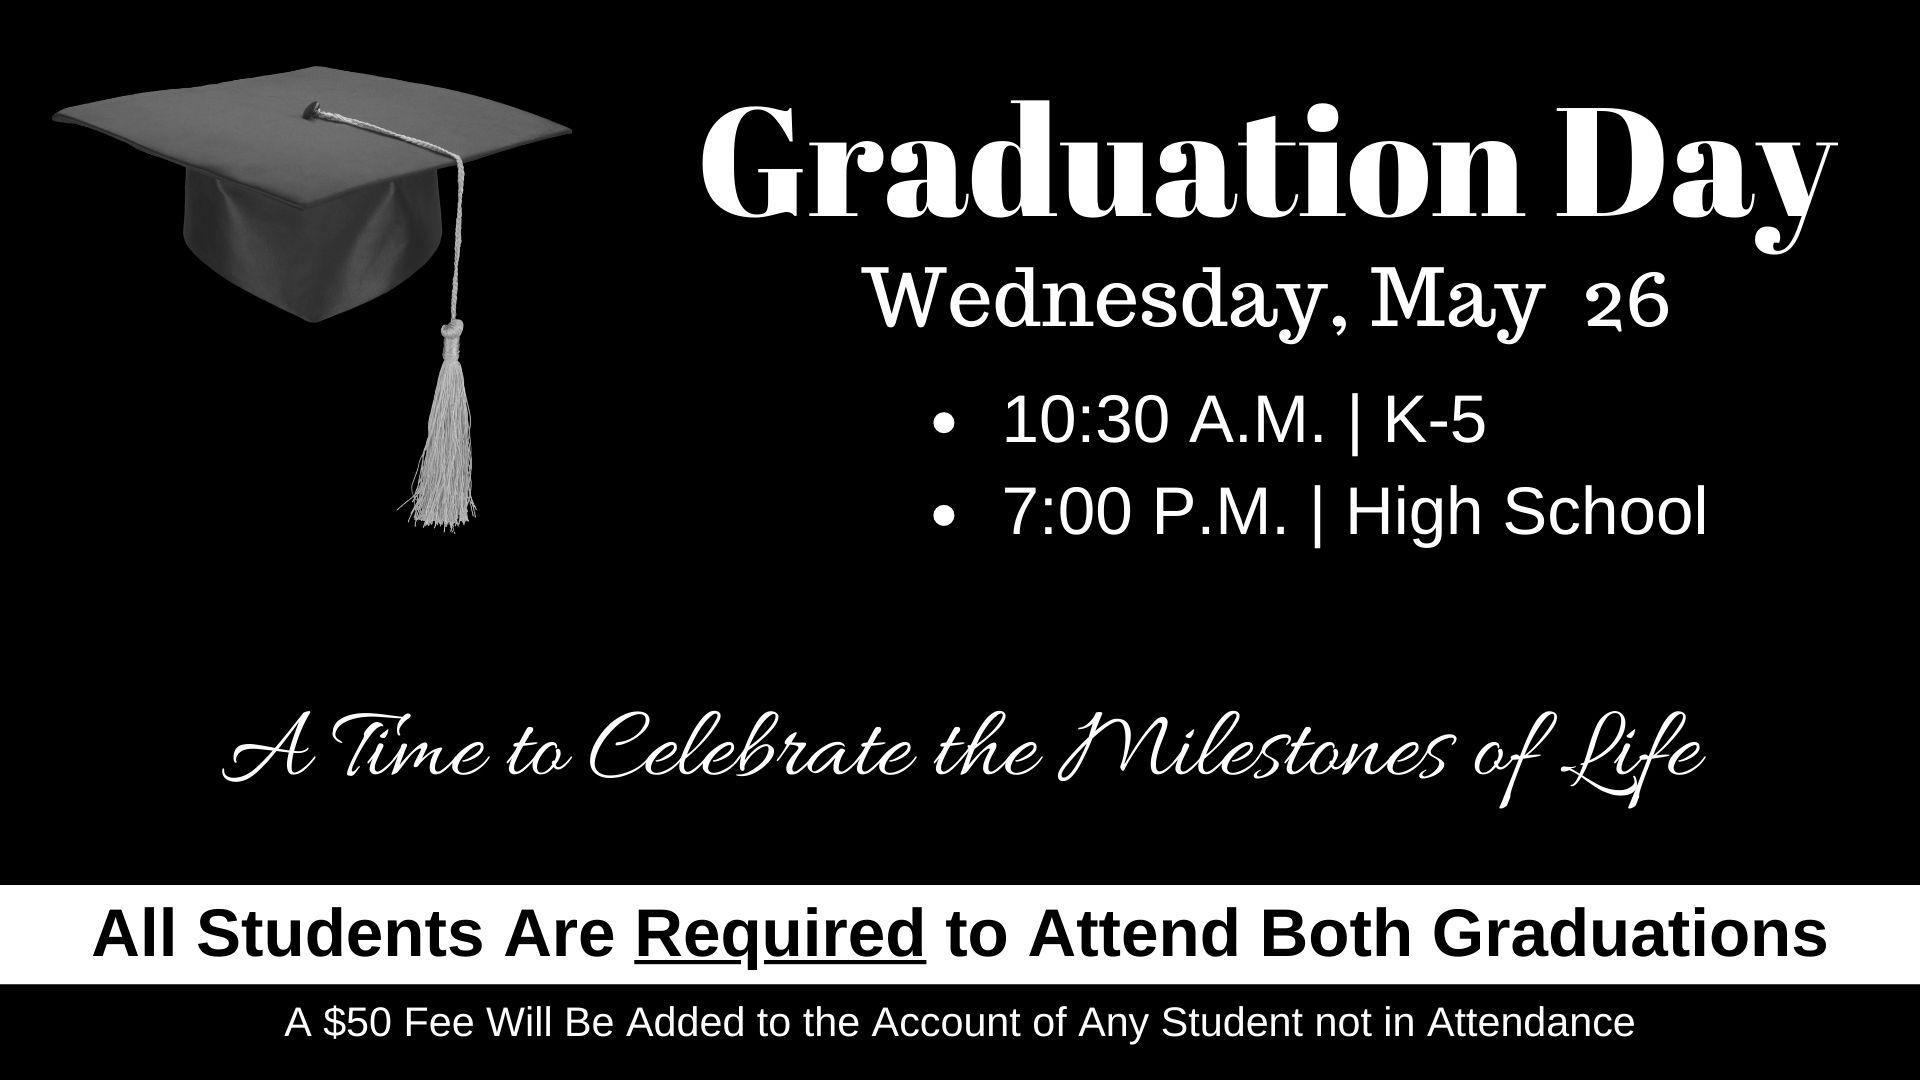 Graduation Day graphic